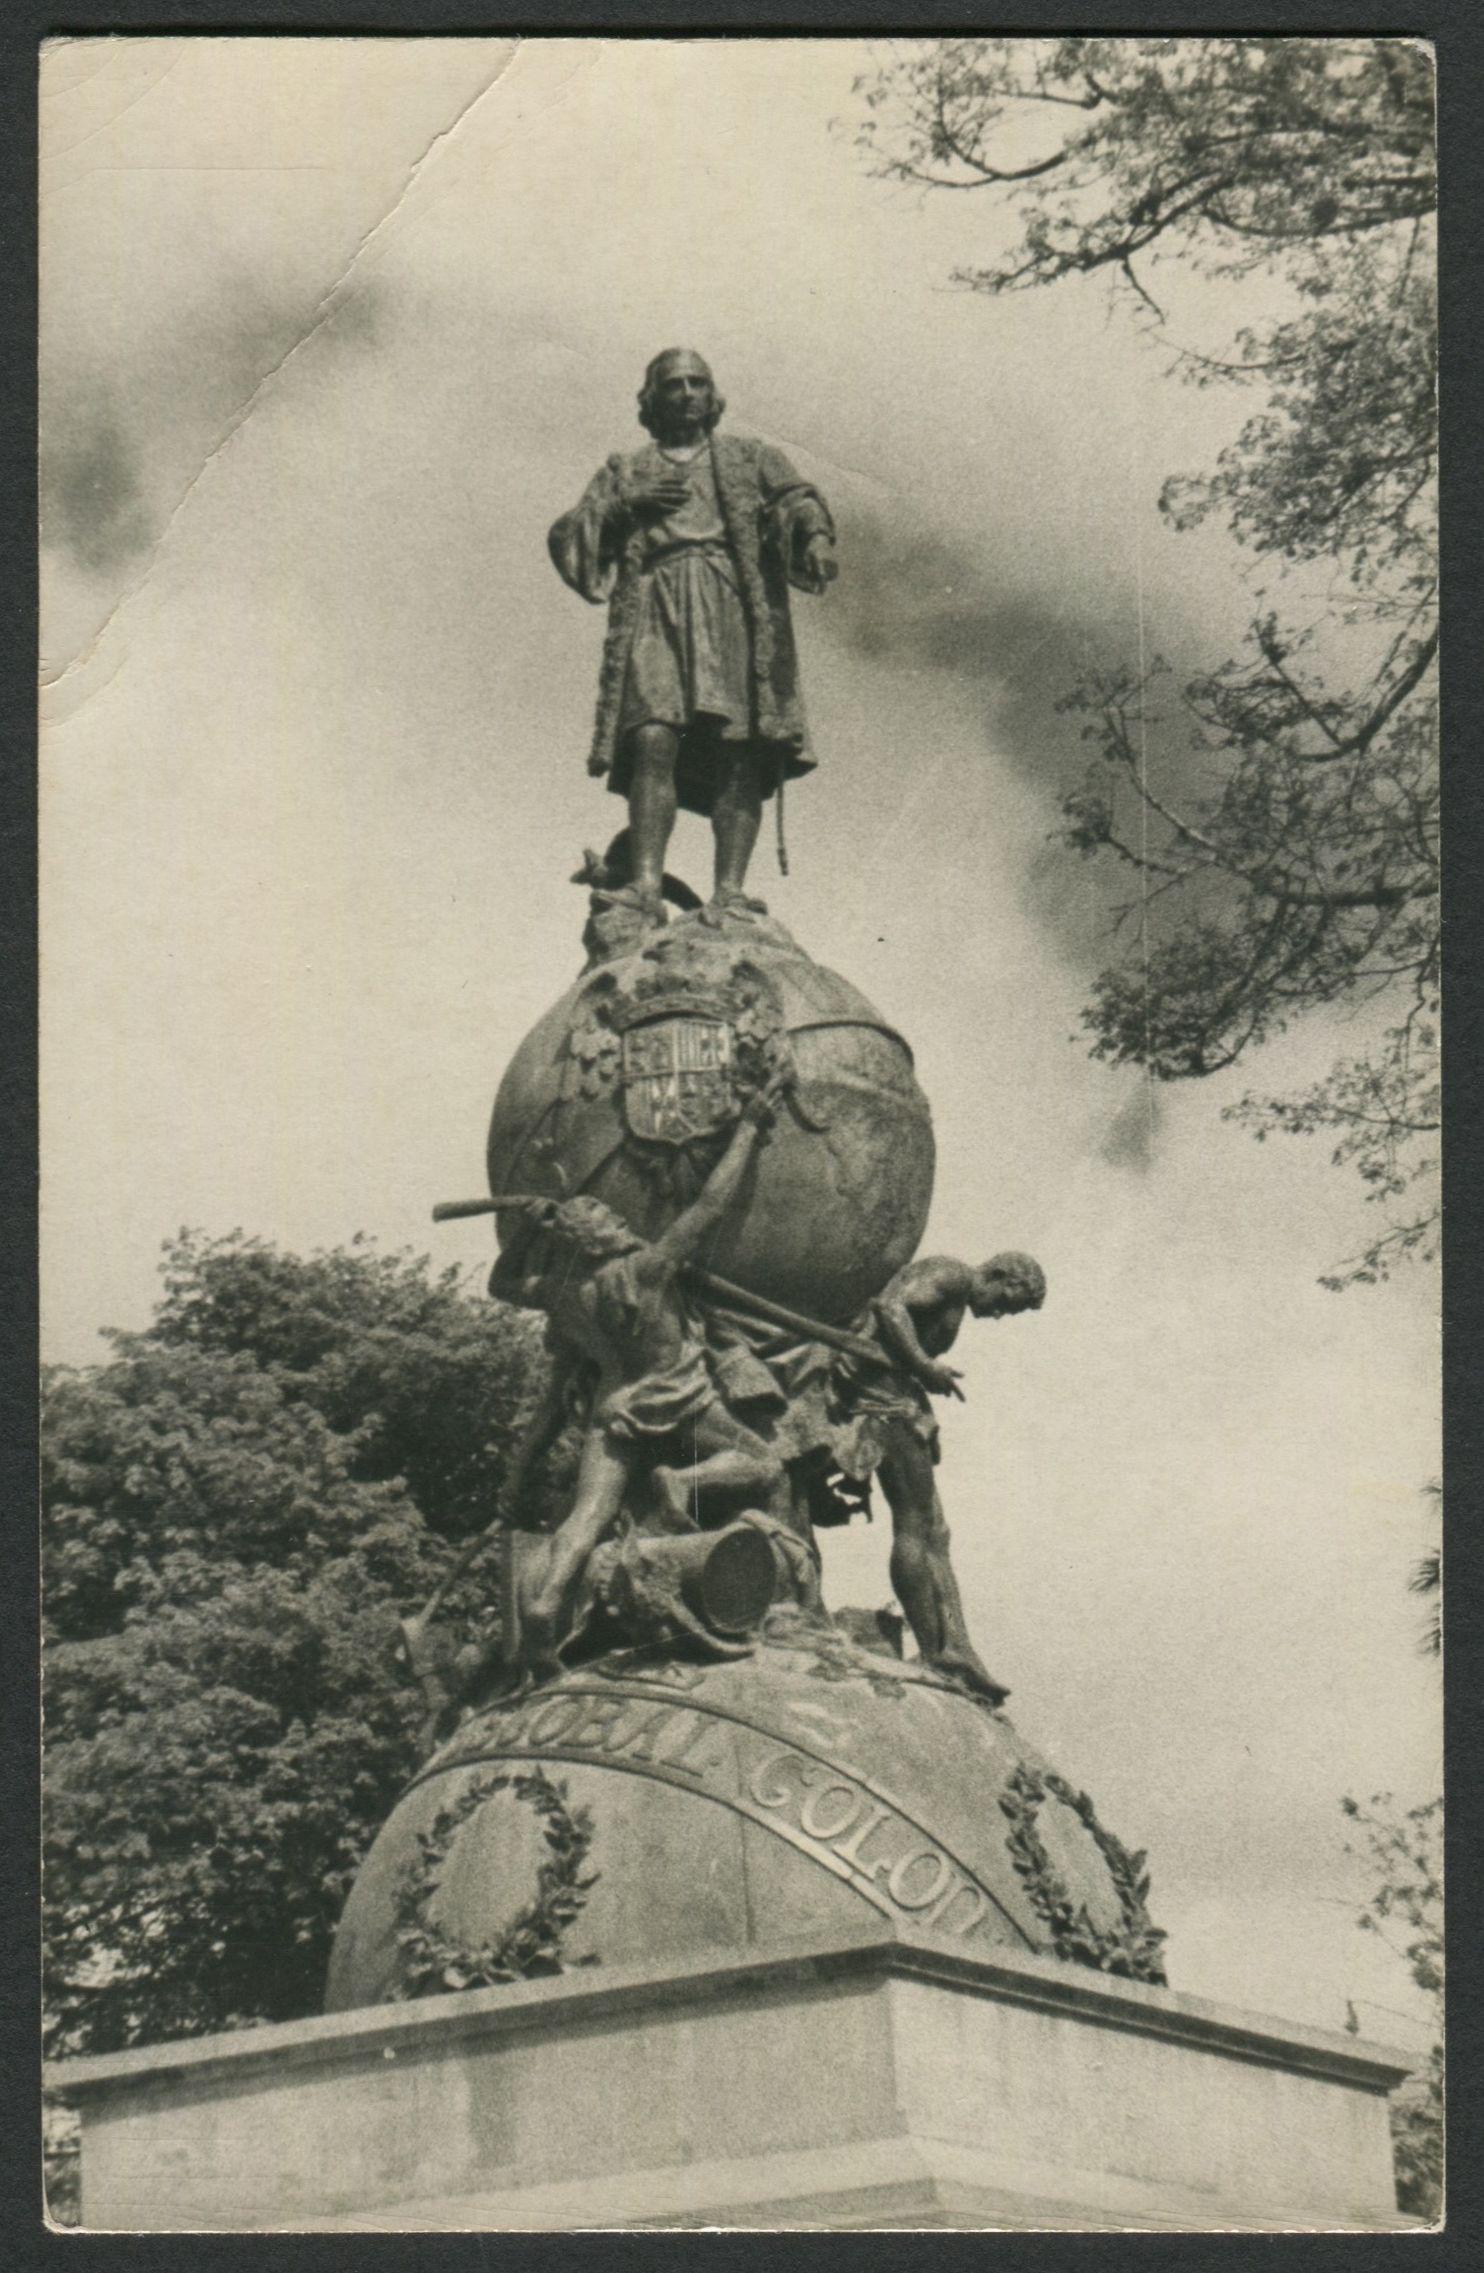 Real Photo Postcard Columbus Monument Monumento A Colon In Guatemala City Guatemala Dedicated In Plaza Mayor In 1896 Statue Bronze Statue Photo Postcards